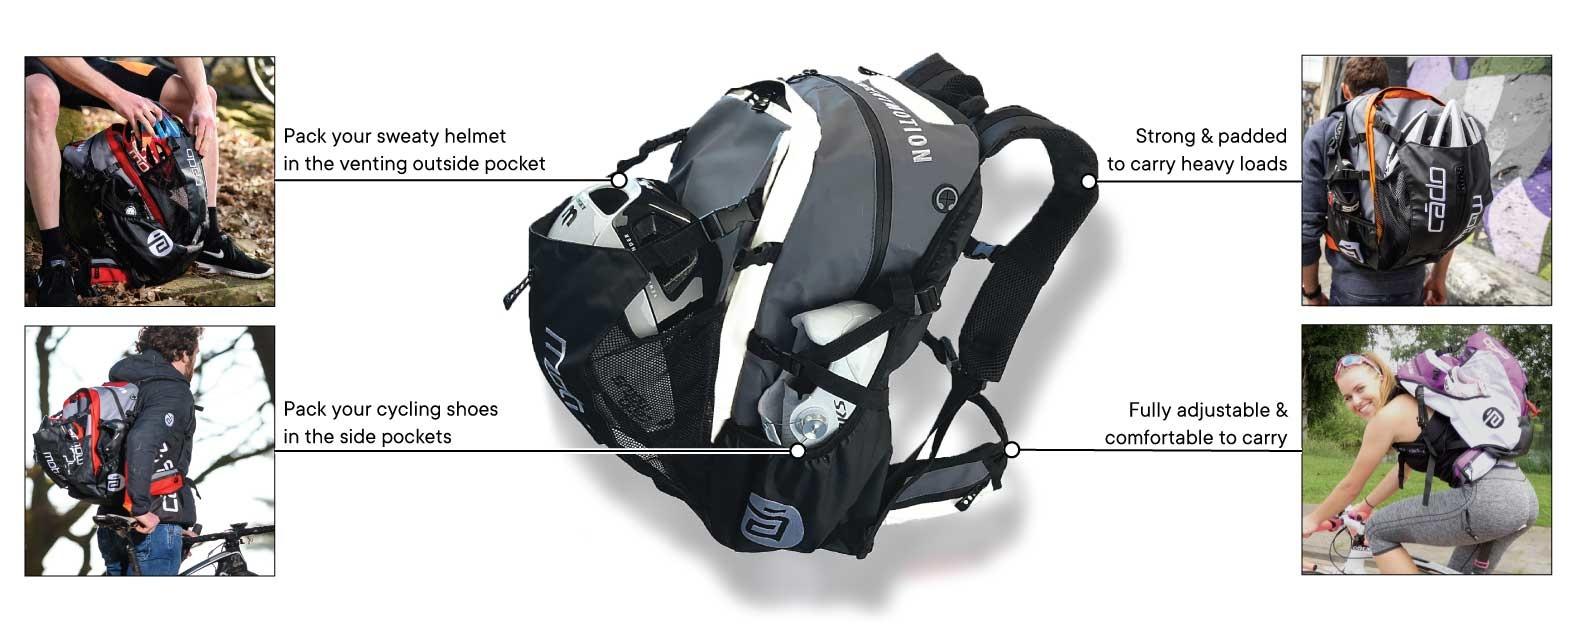 Waterflow Gear Bag Features